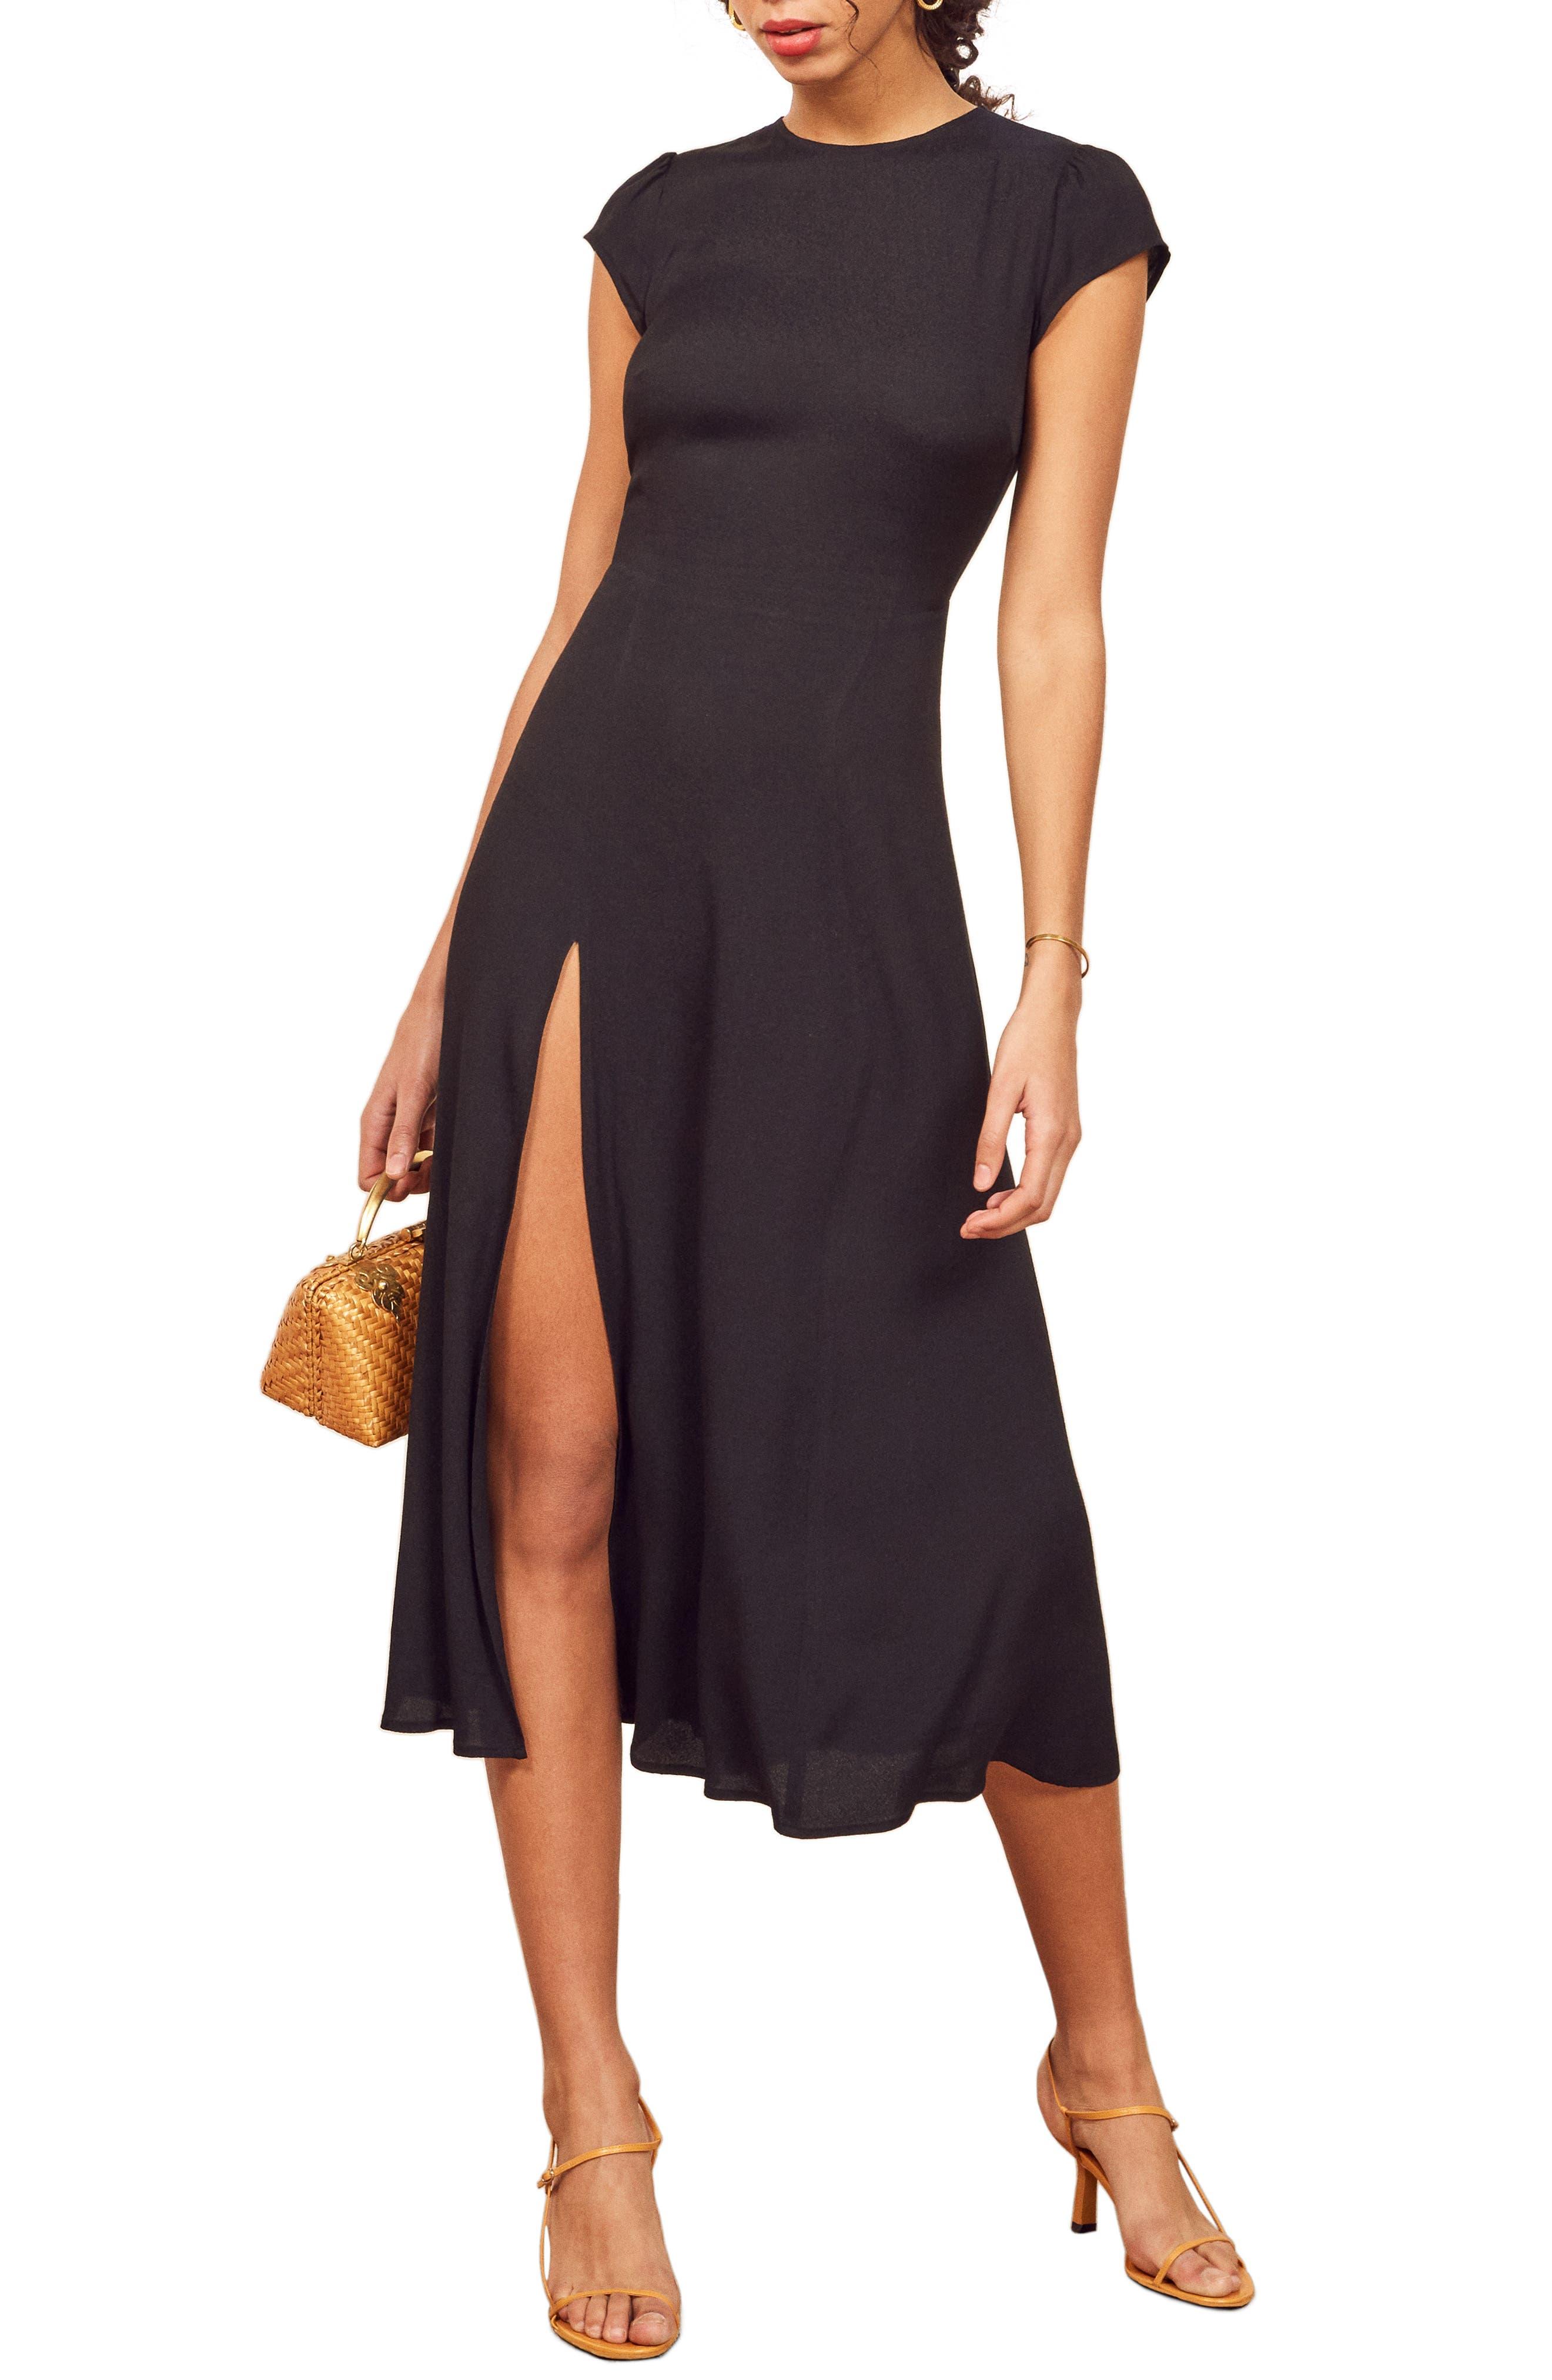 REFORMATION Gavin Dress, Main, color, BLACK